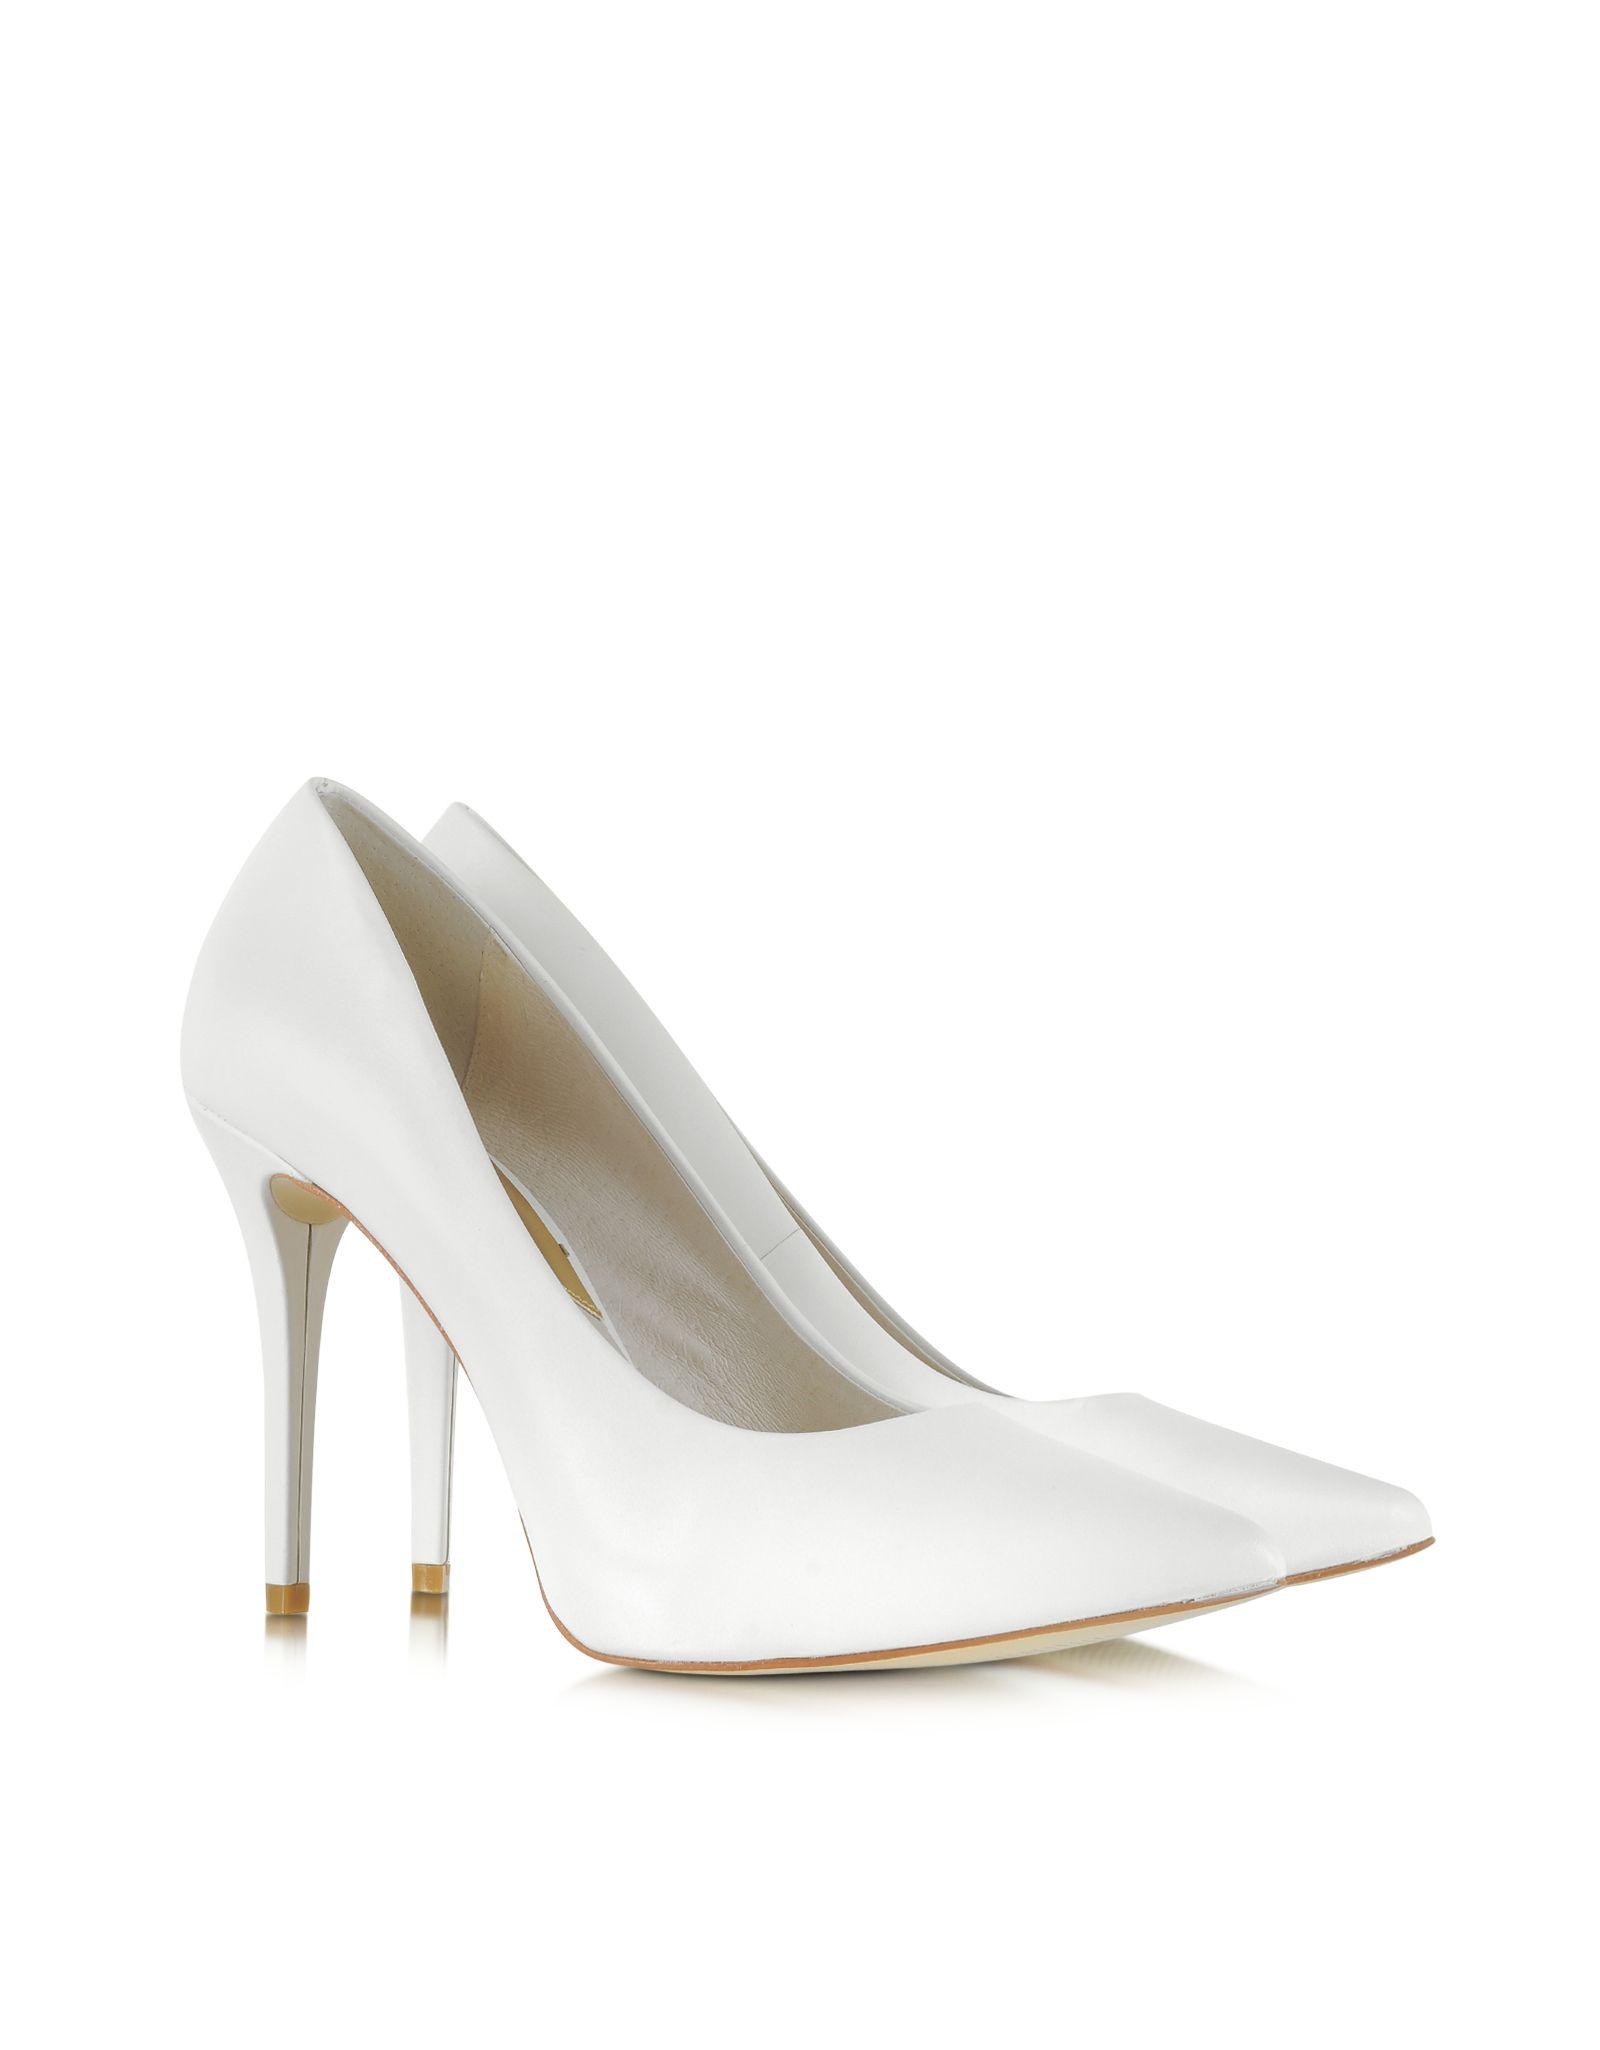 a9de4bcf1e3 ... Pumps 40f3mfmp1a - Michael Kors Joselle Optic White Pointed-Toe Leather  Pump 7M at FORZIERI 210 ...